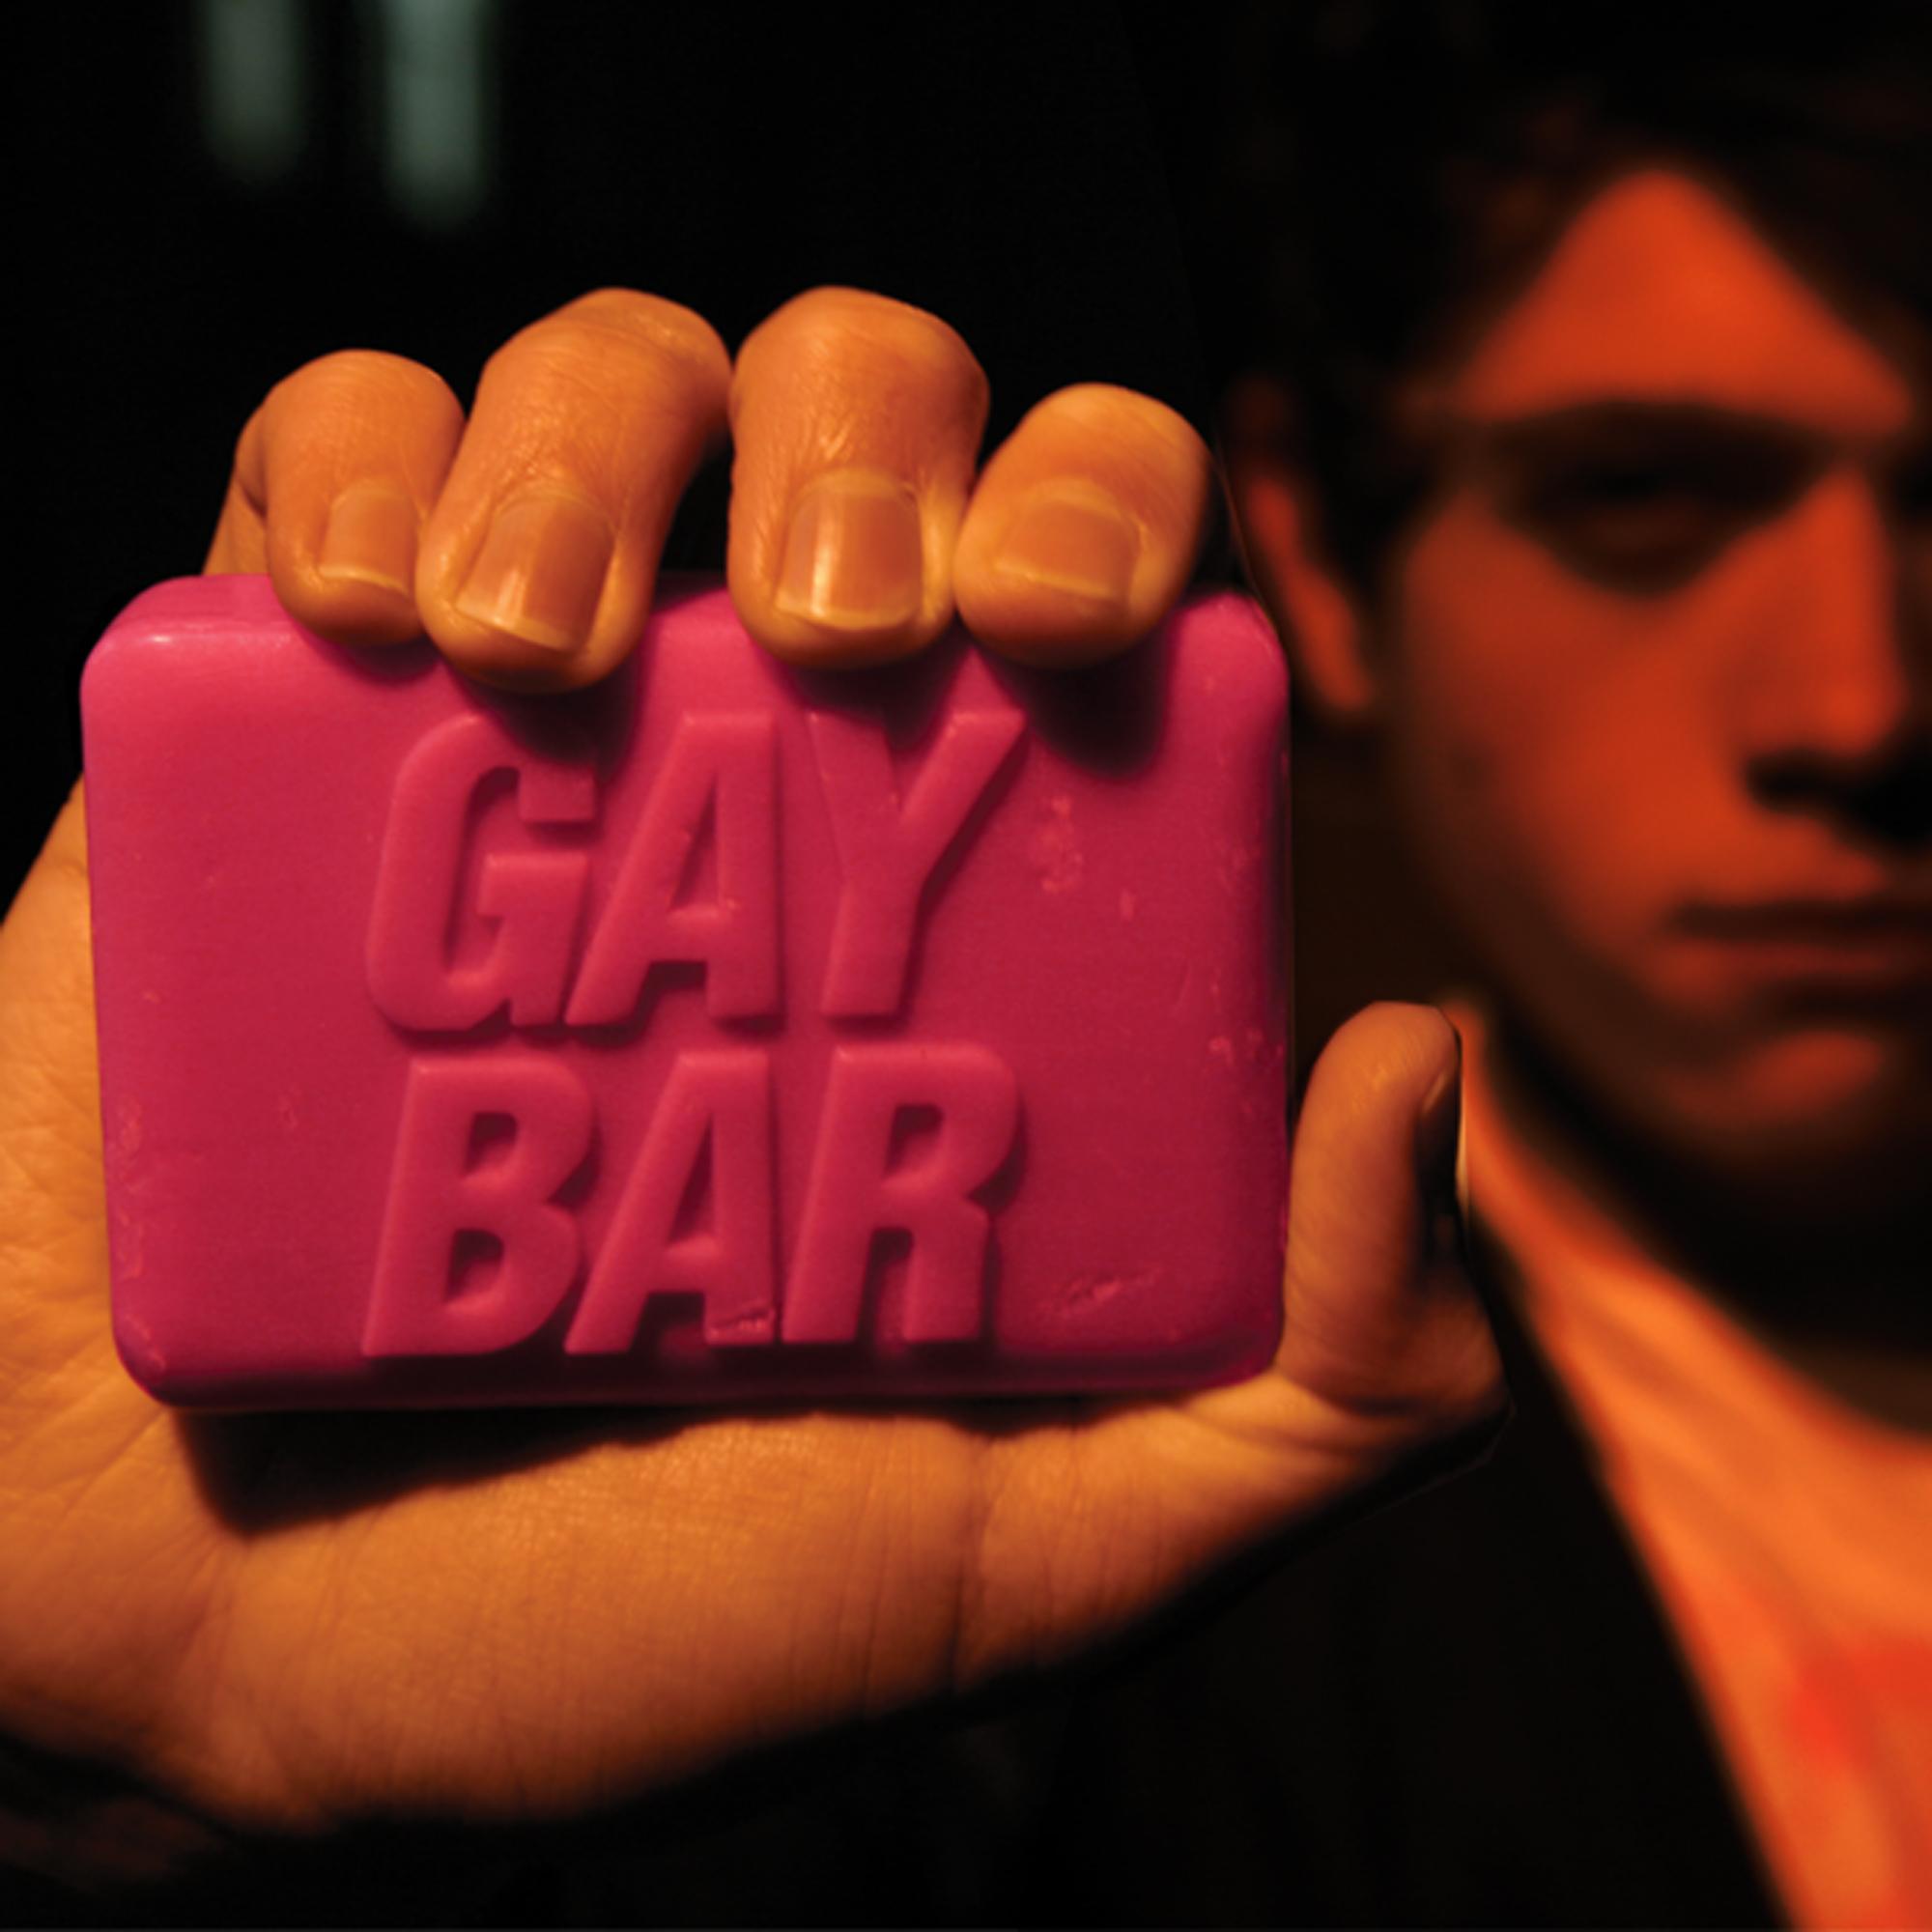 shaved goat gay